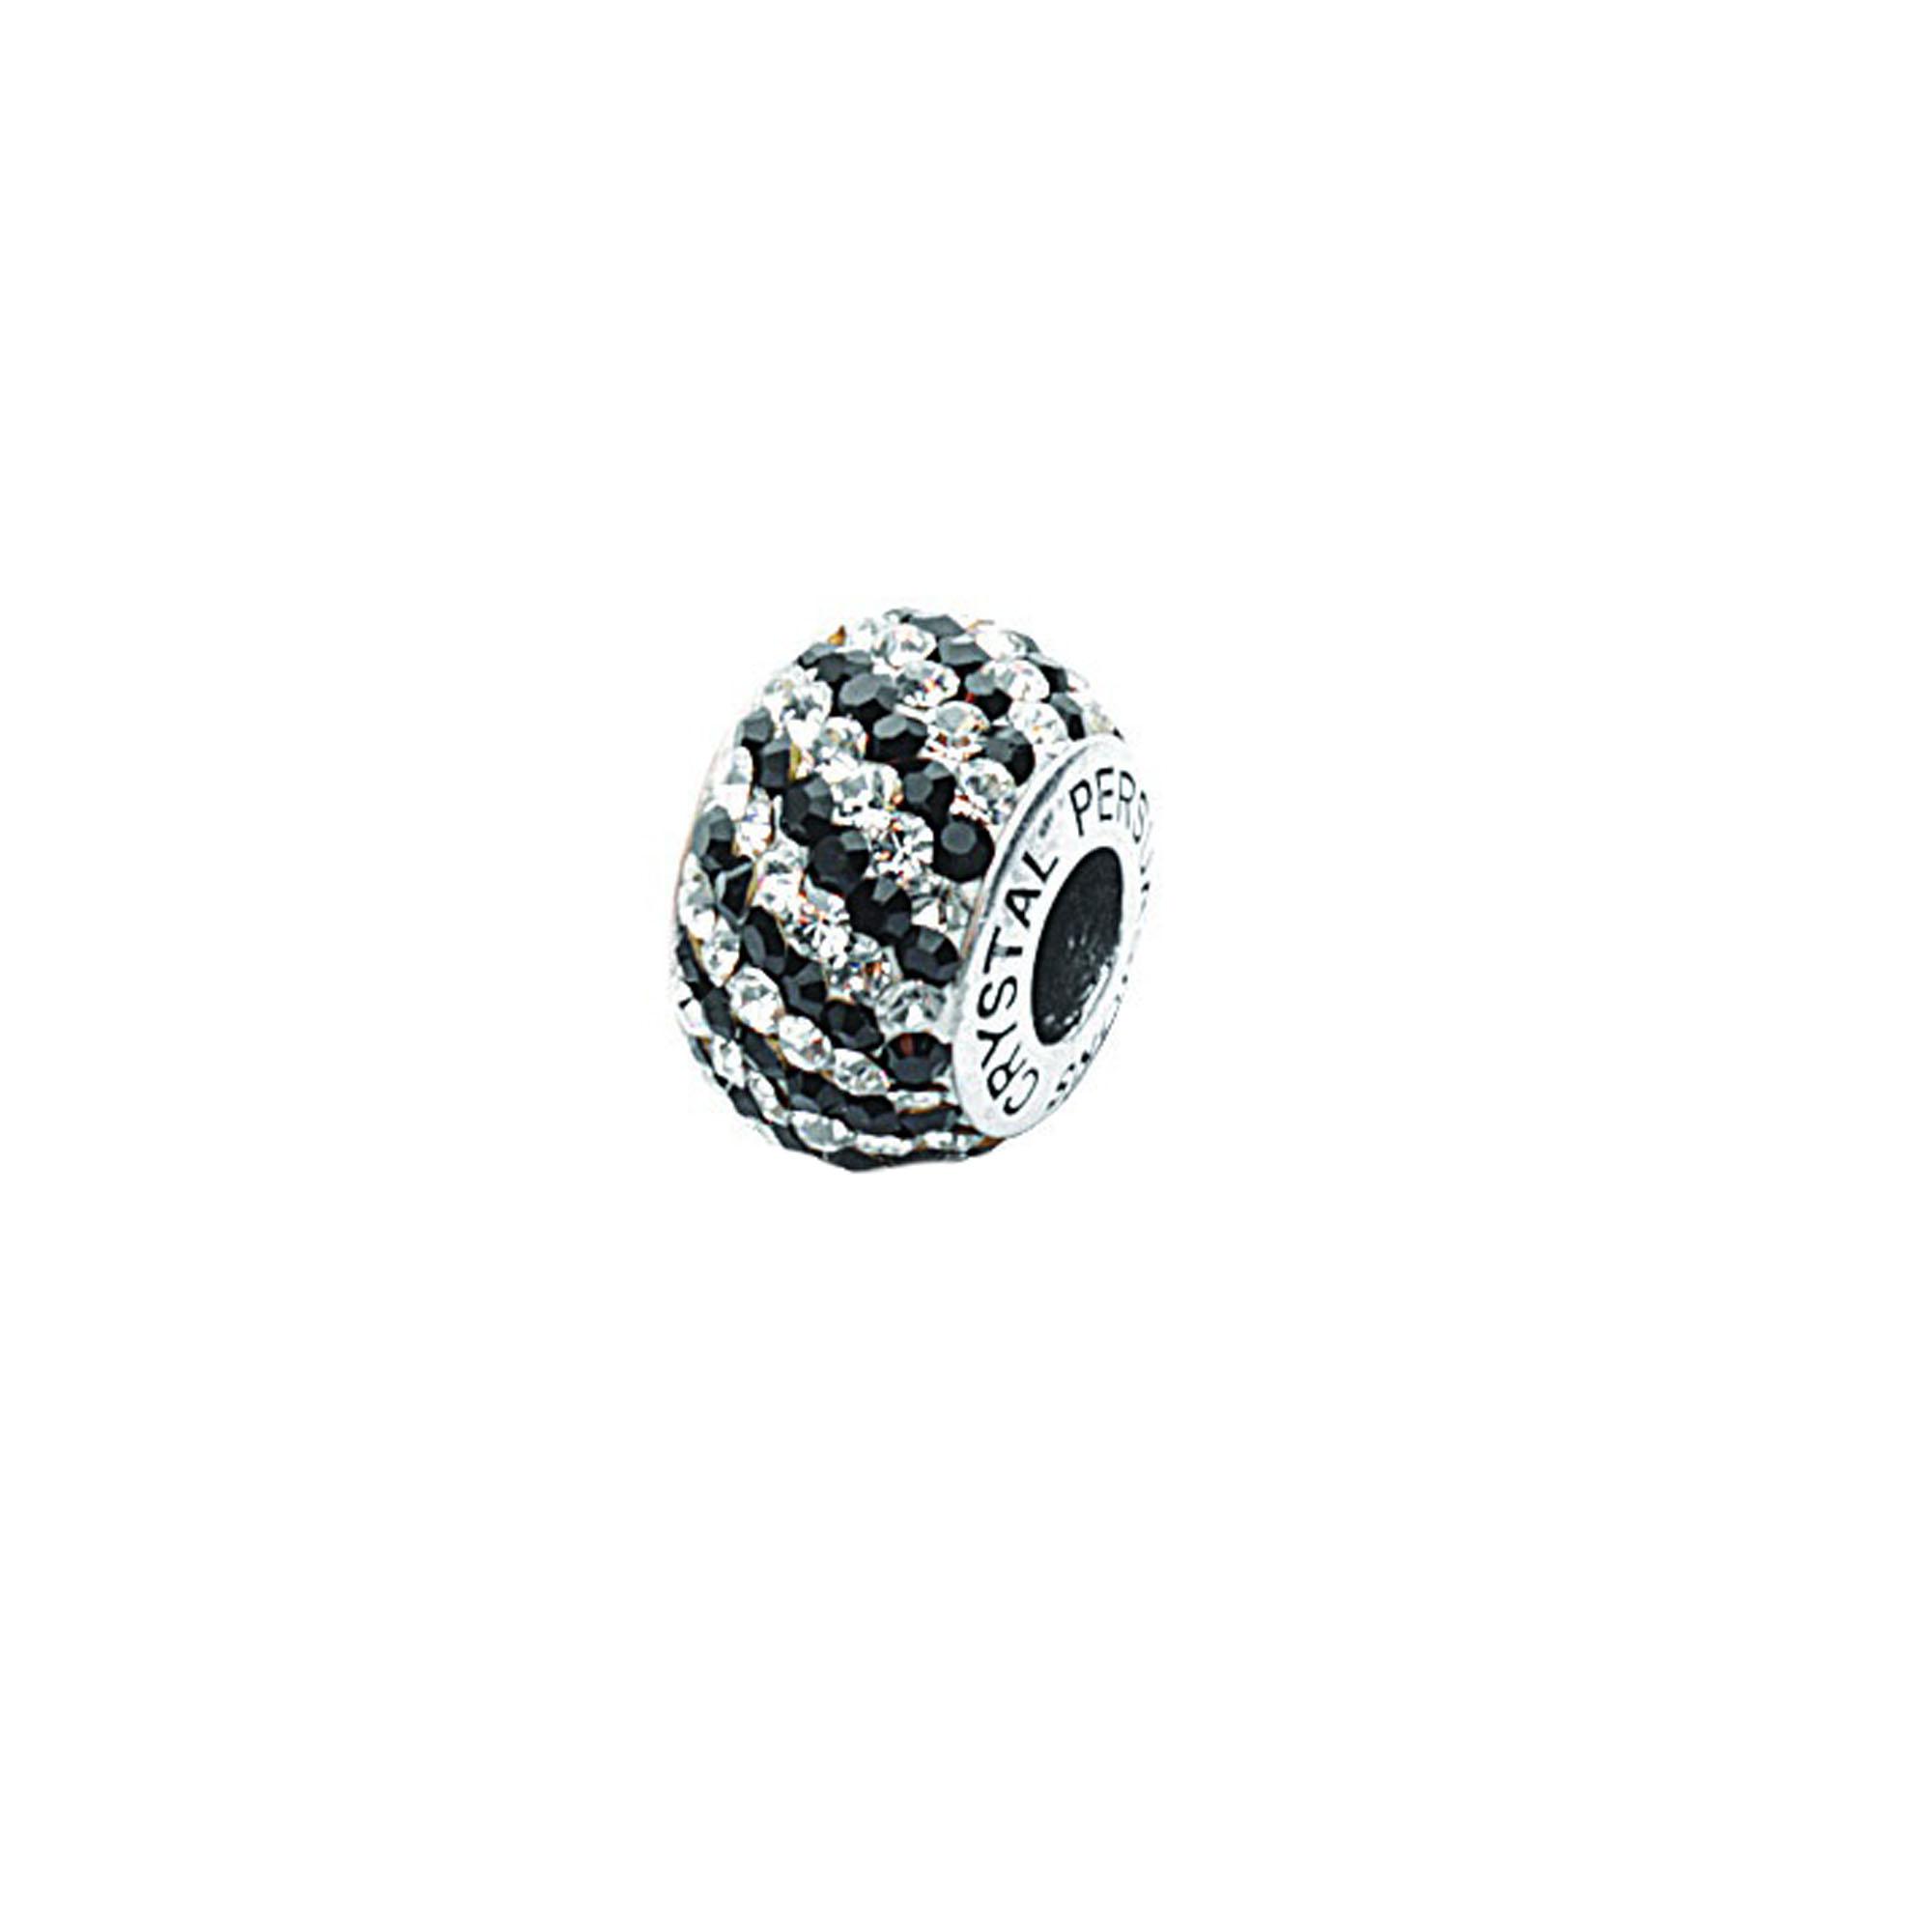 Silver Pendant, Black/ White Swirl Crystal Bead